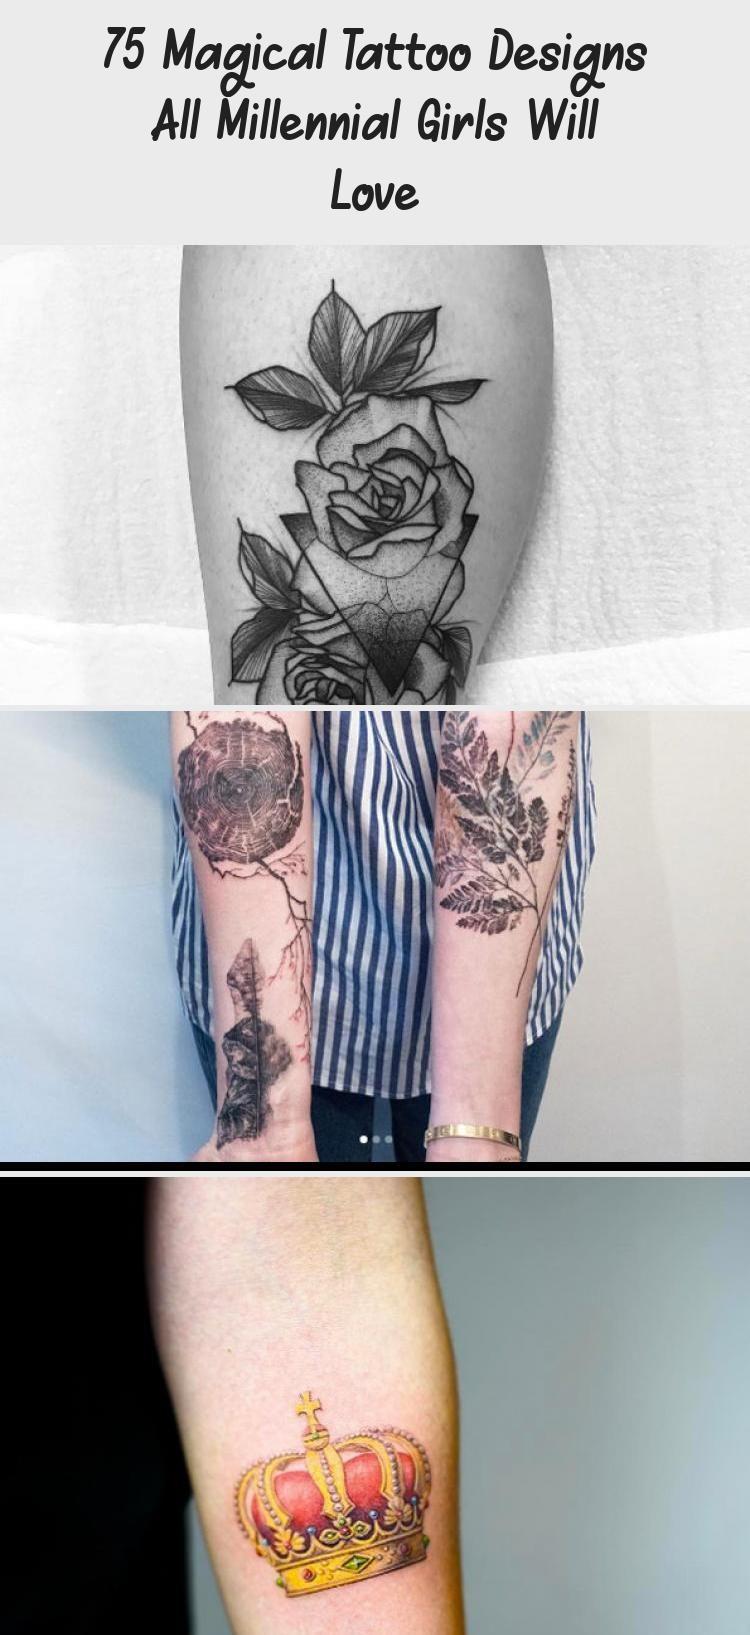 75 Magical Tattoo Designs All Millennial Girls Will Love - Tattoo Blog